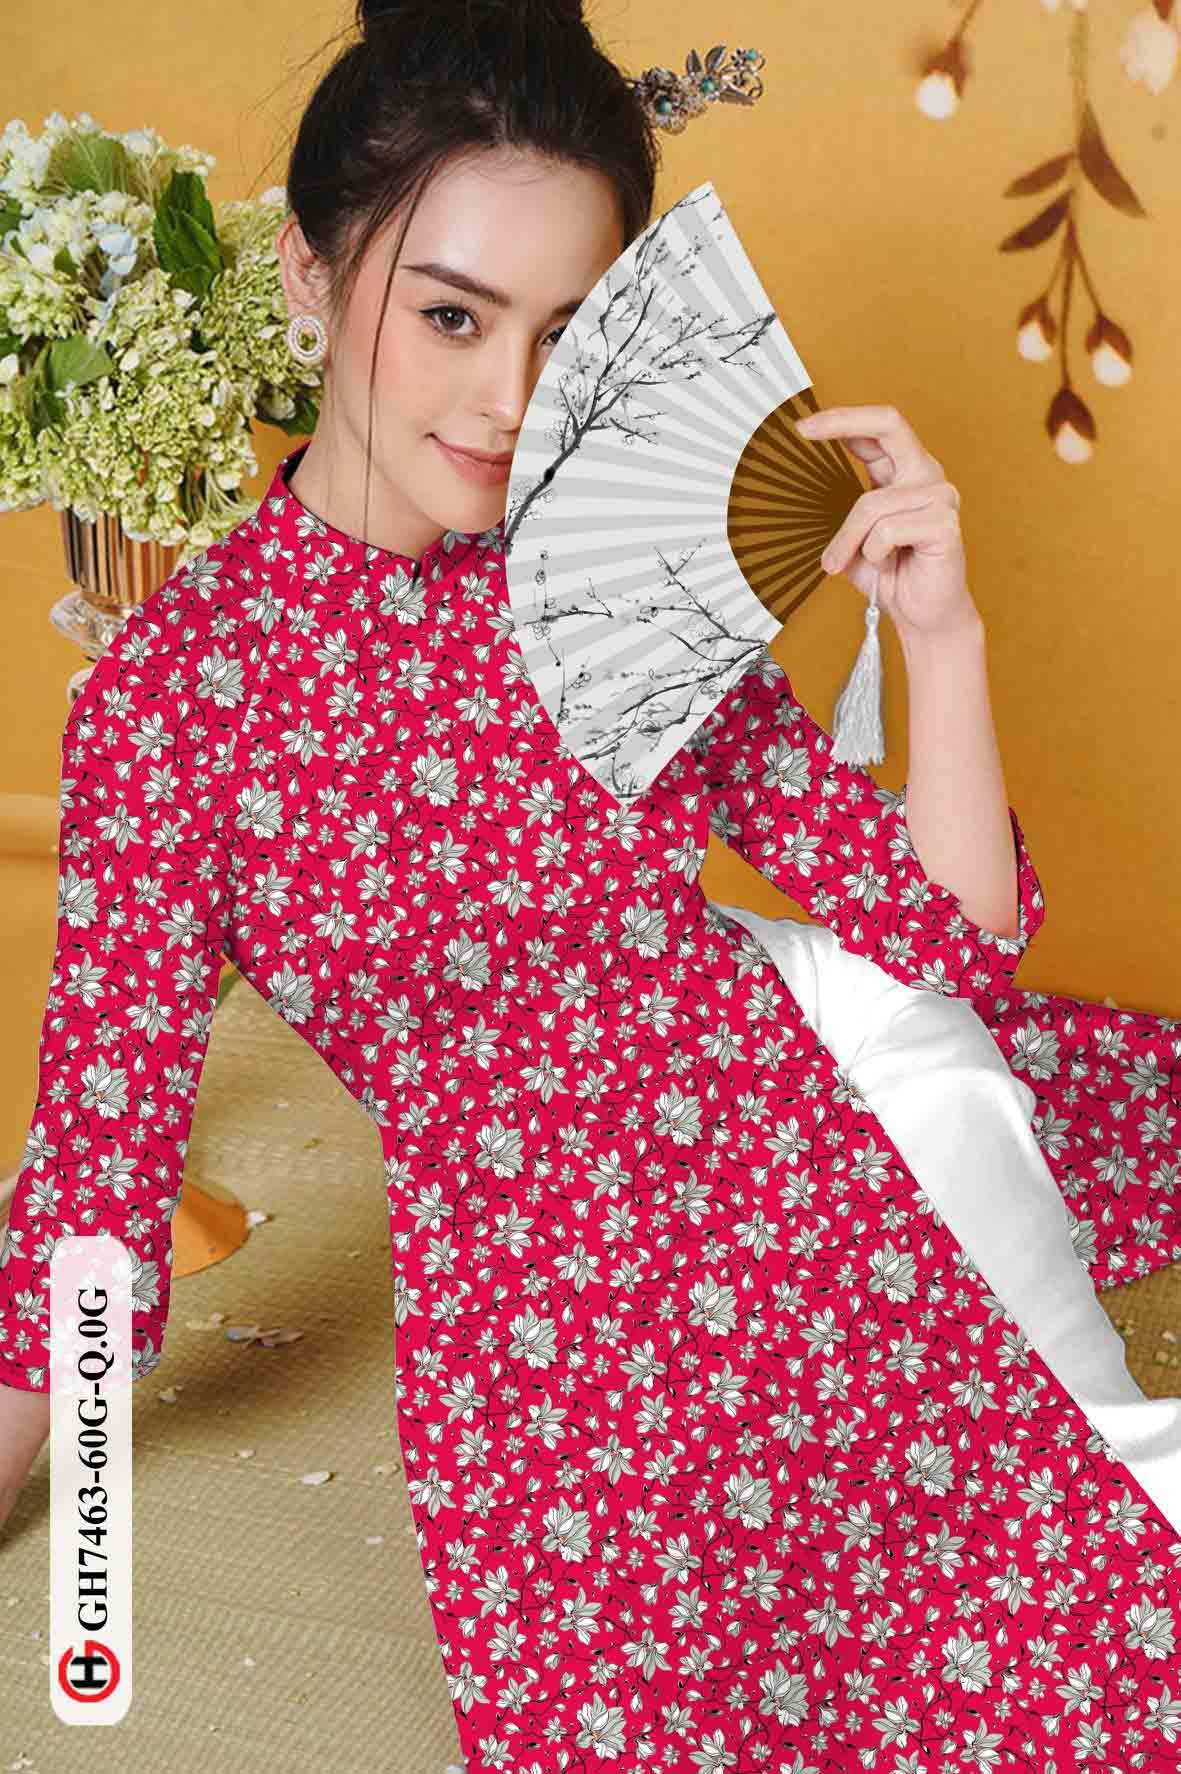 Vải áo dài hoa nhí AD GH7463 32